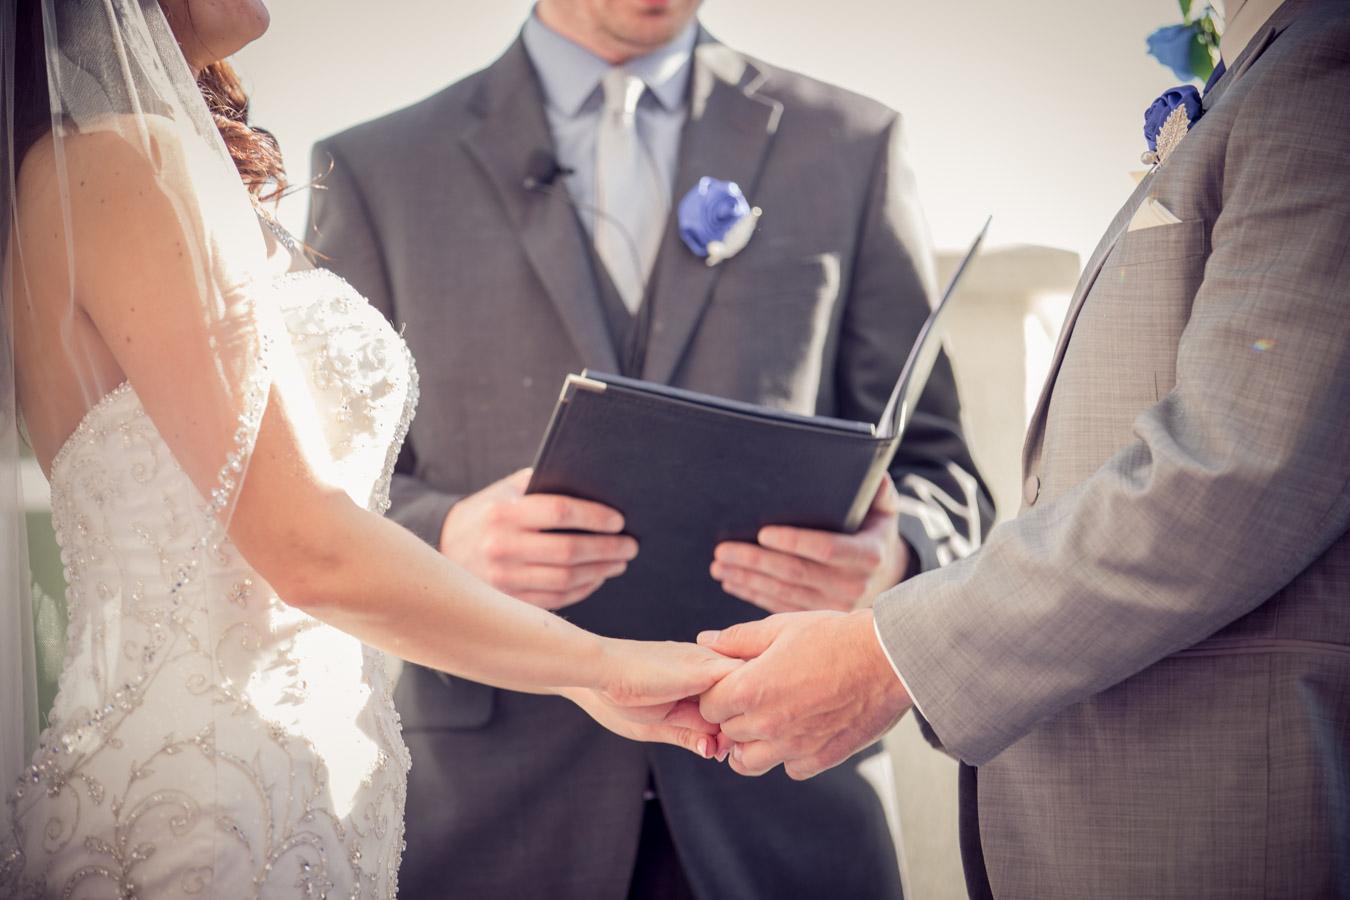 NEPA_Pocono_Weddings_Rob_Lettieri_Photography_10.jpg